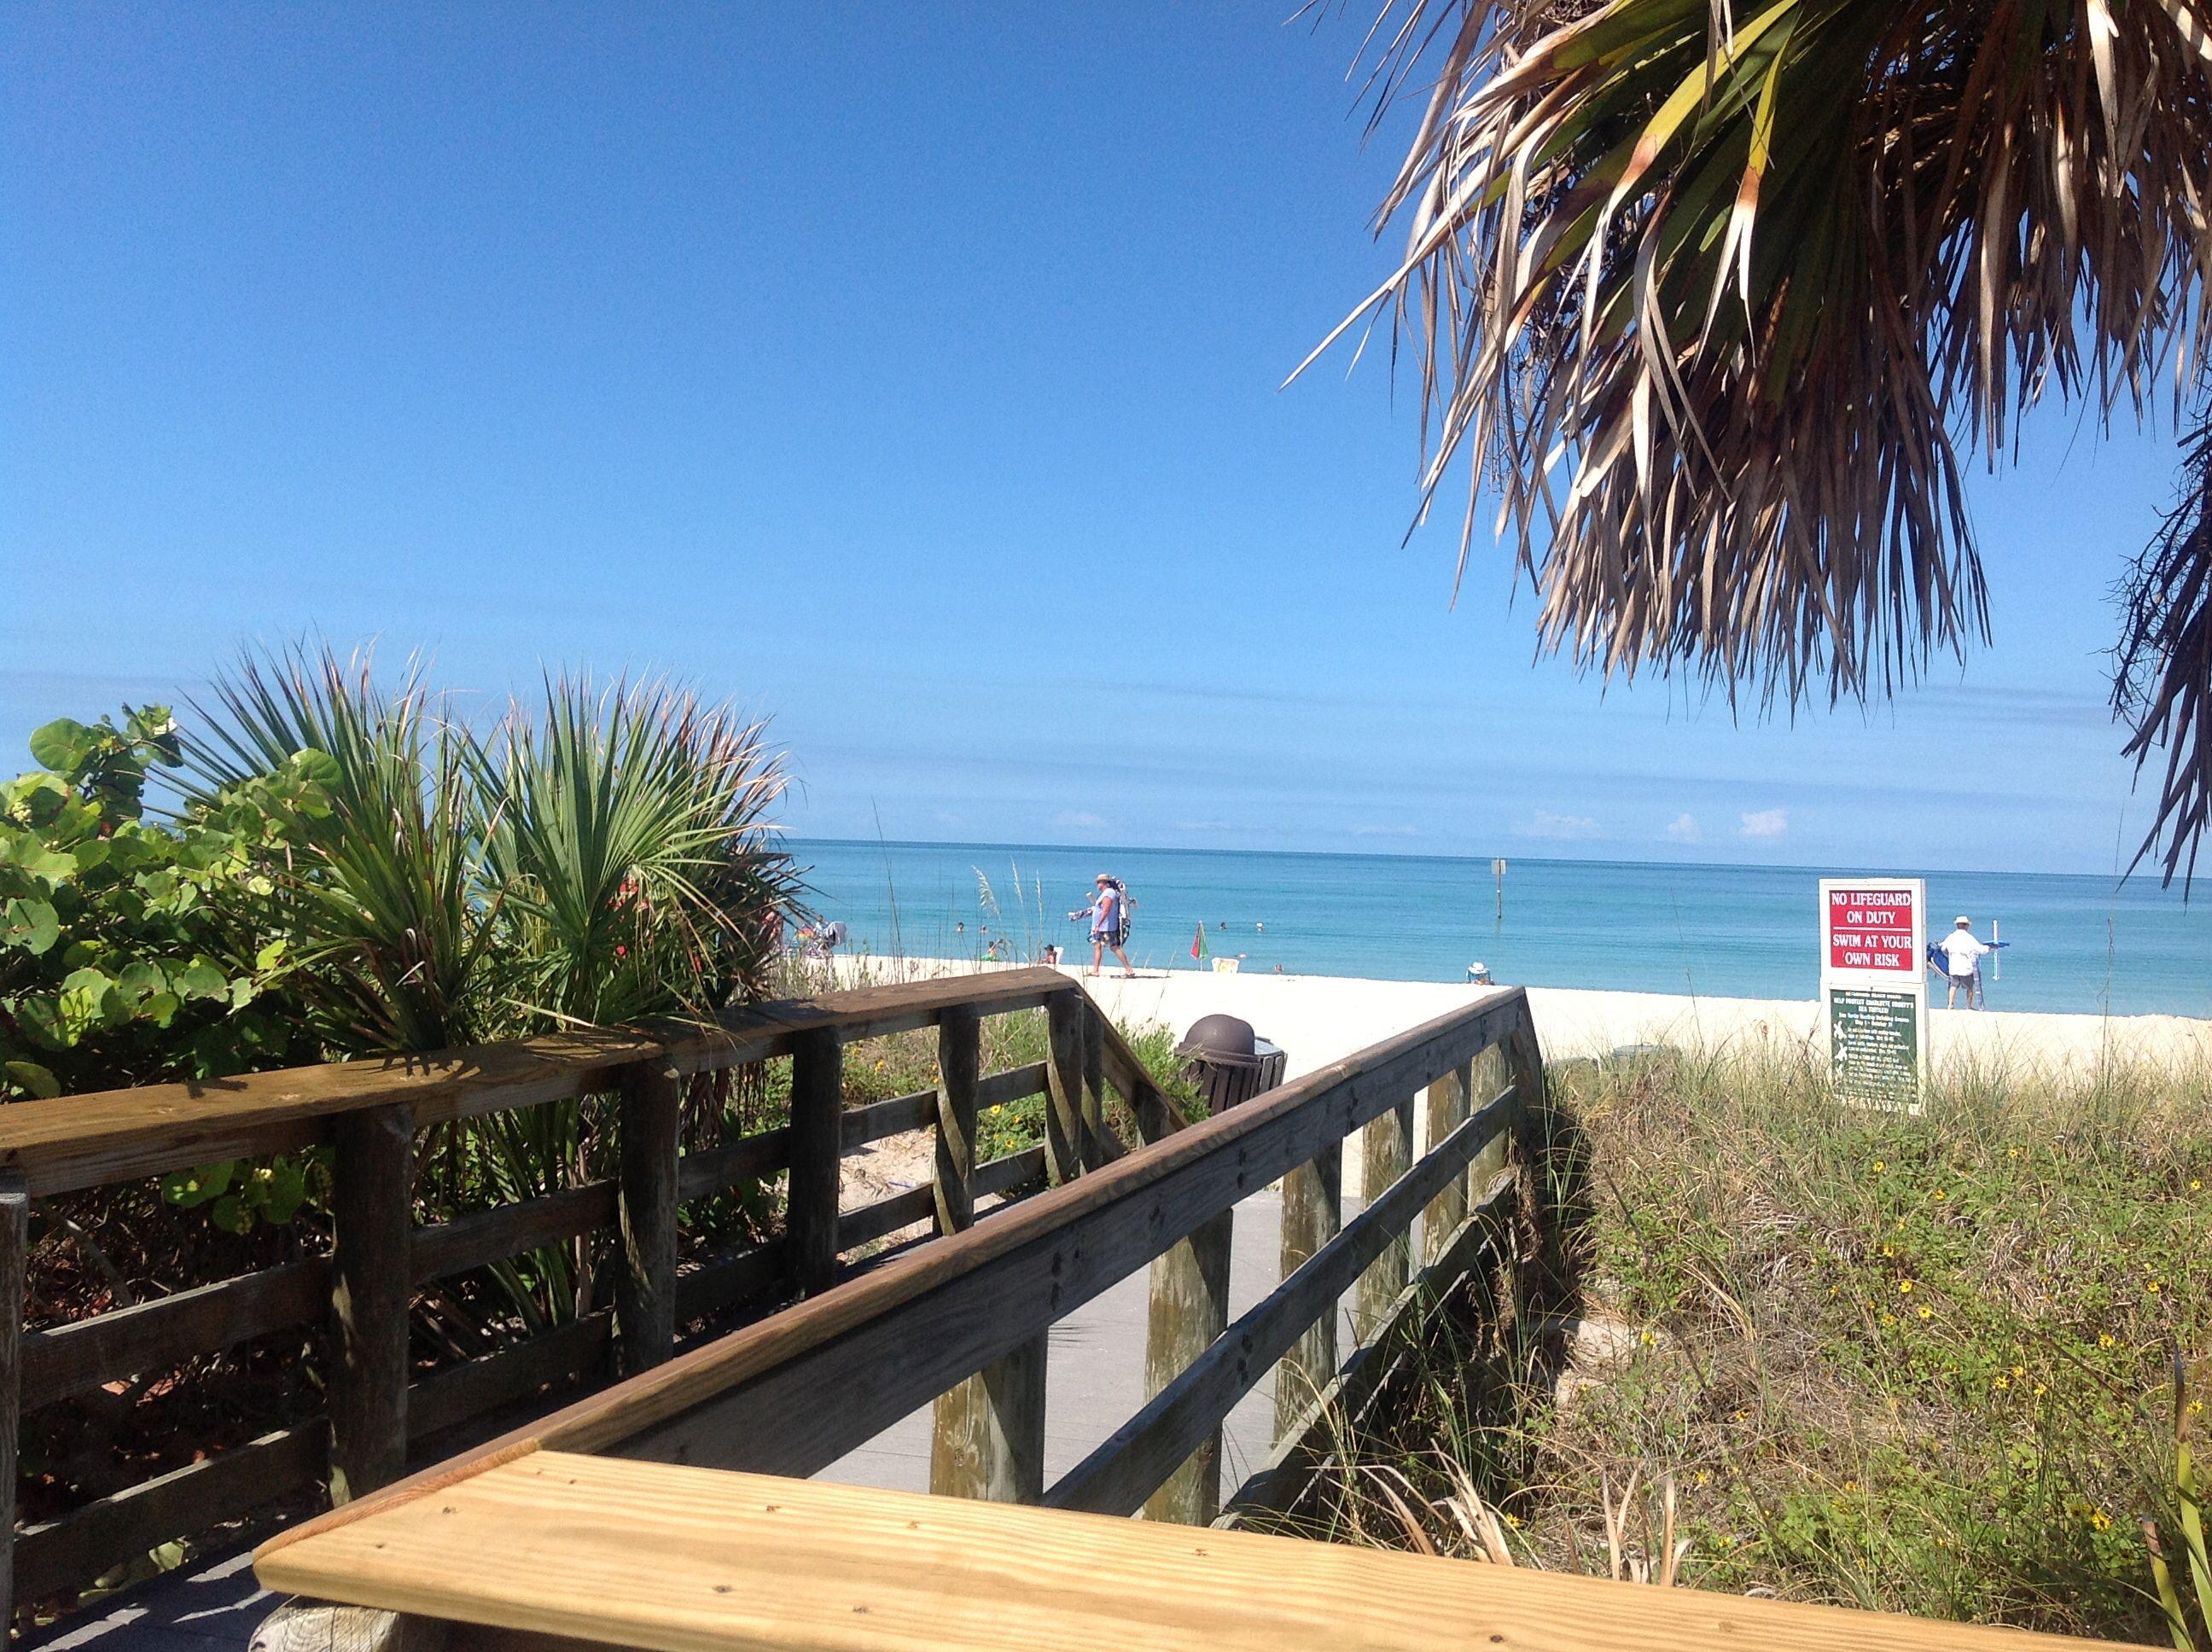 Beach at Englewood | Beach decor, Manasota key florida, Beach